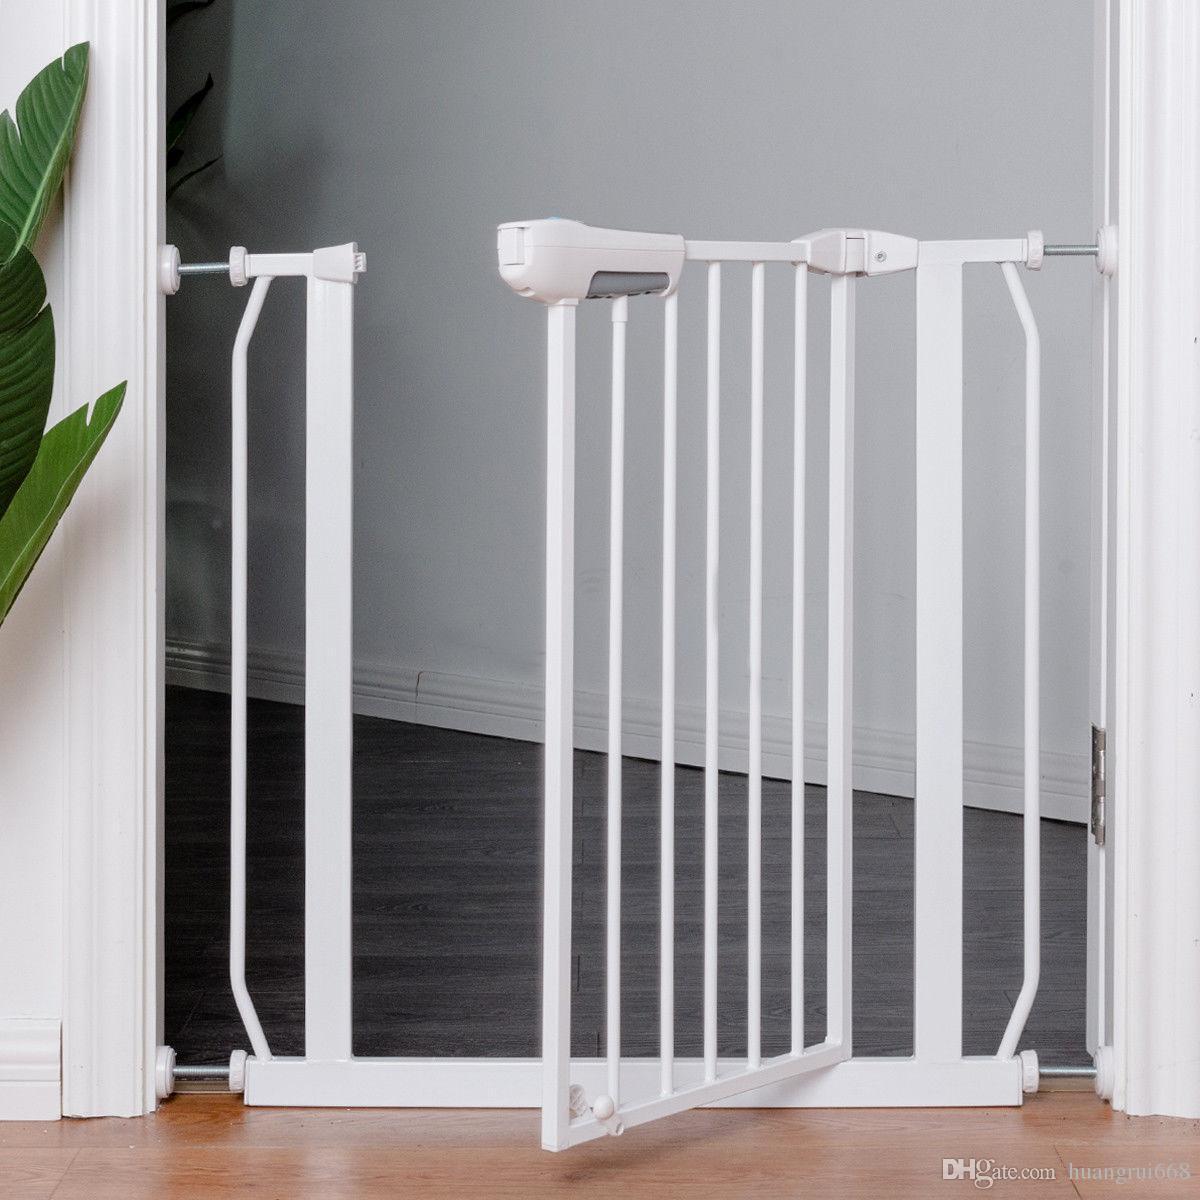 2018 Easy Locking System Kids Baby Pet Safety Gate Door Walk Through